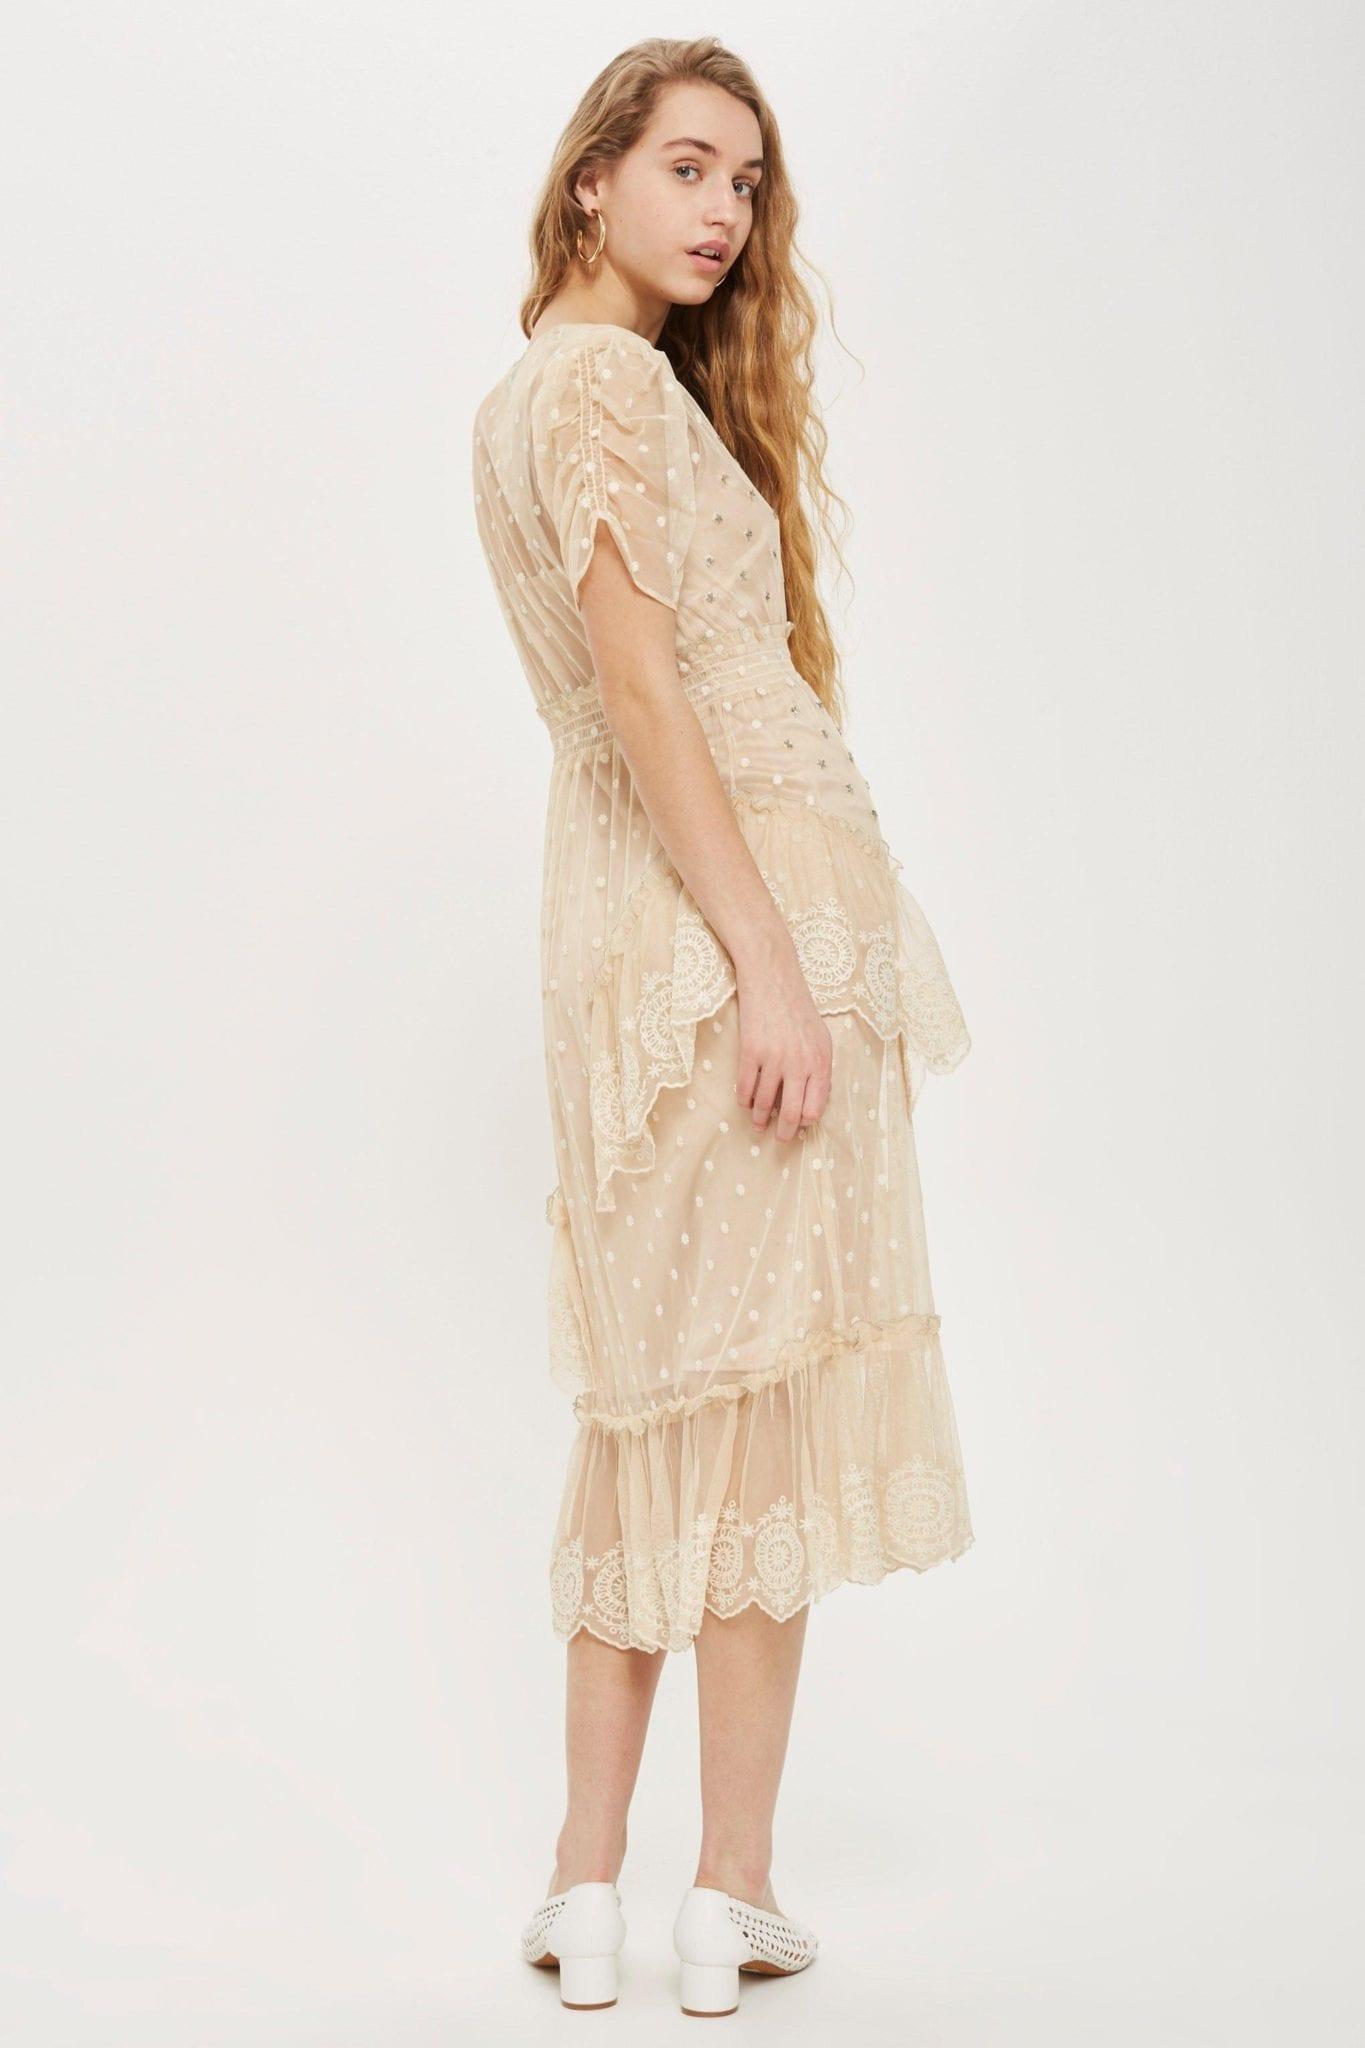 TOP SHOP Embellished Mesh Tier Midi Ivory Dress